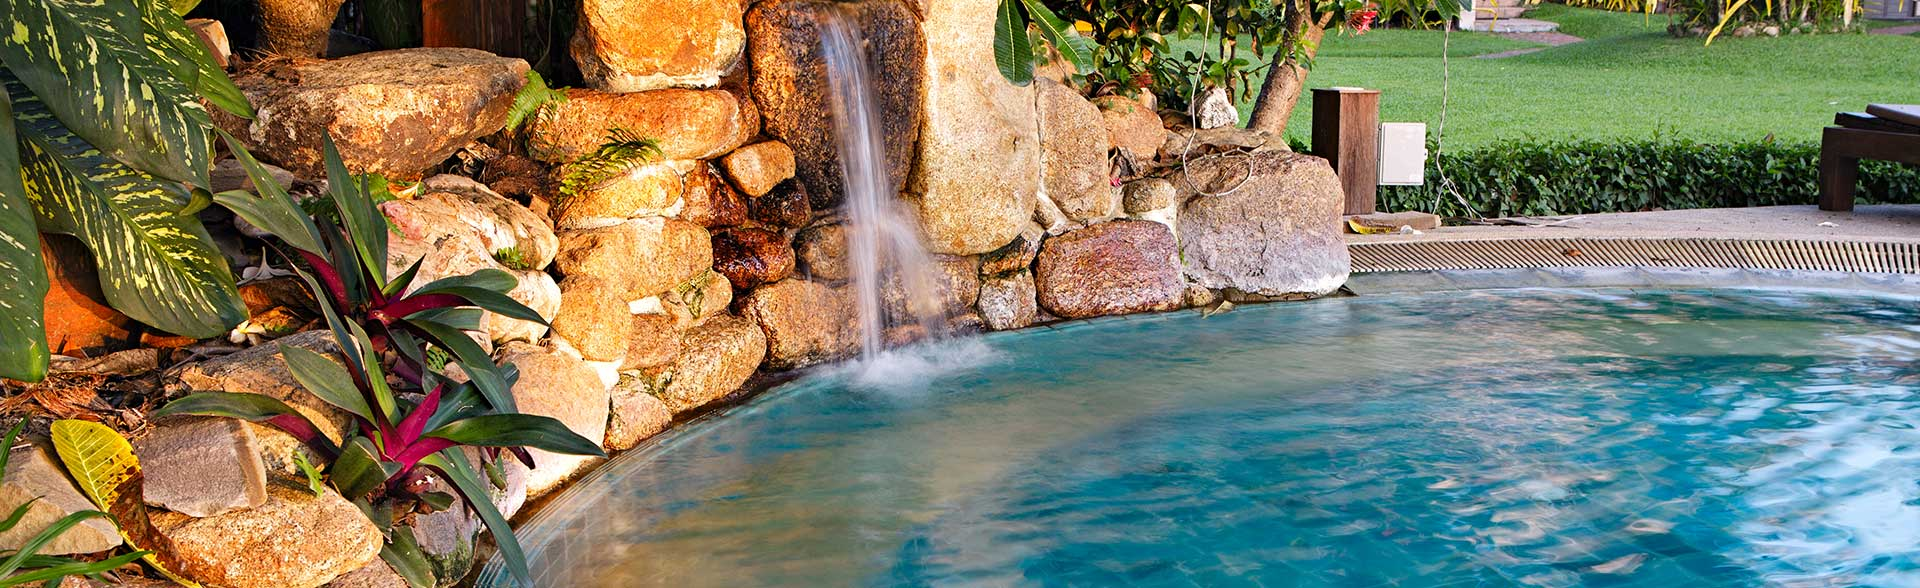 outdoor pool patio waterfall